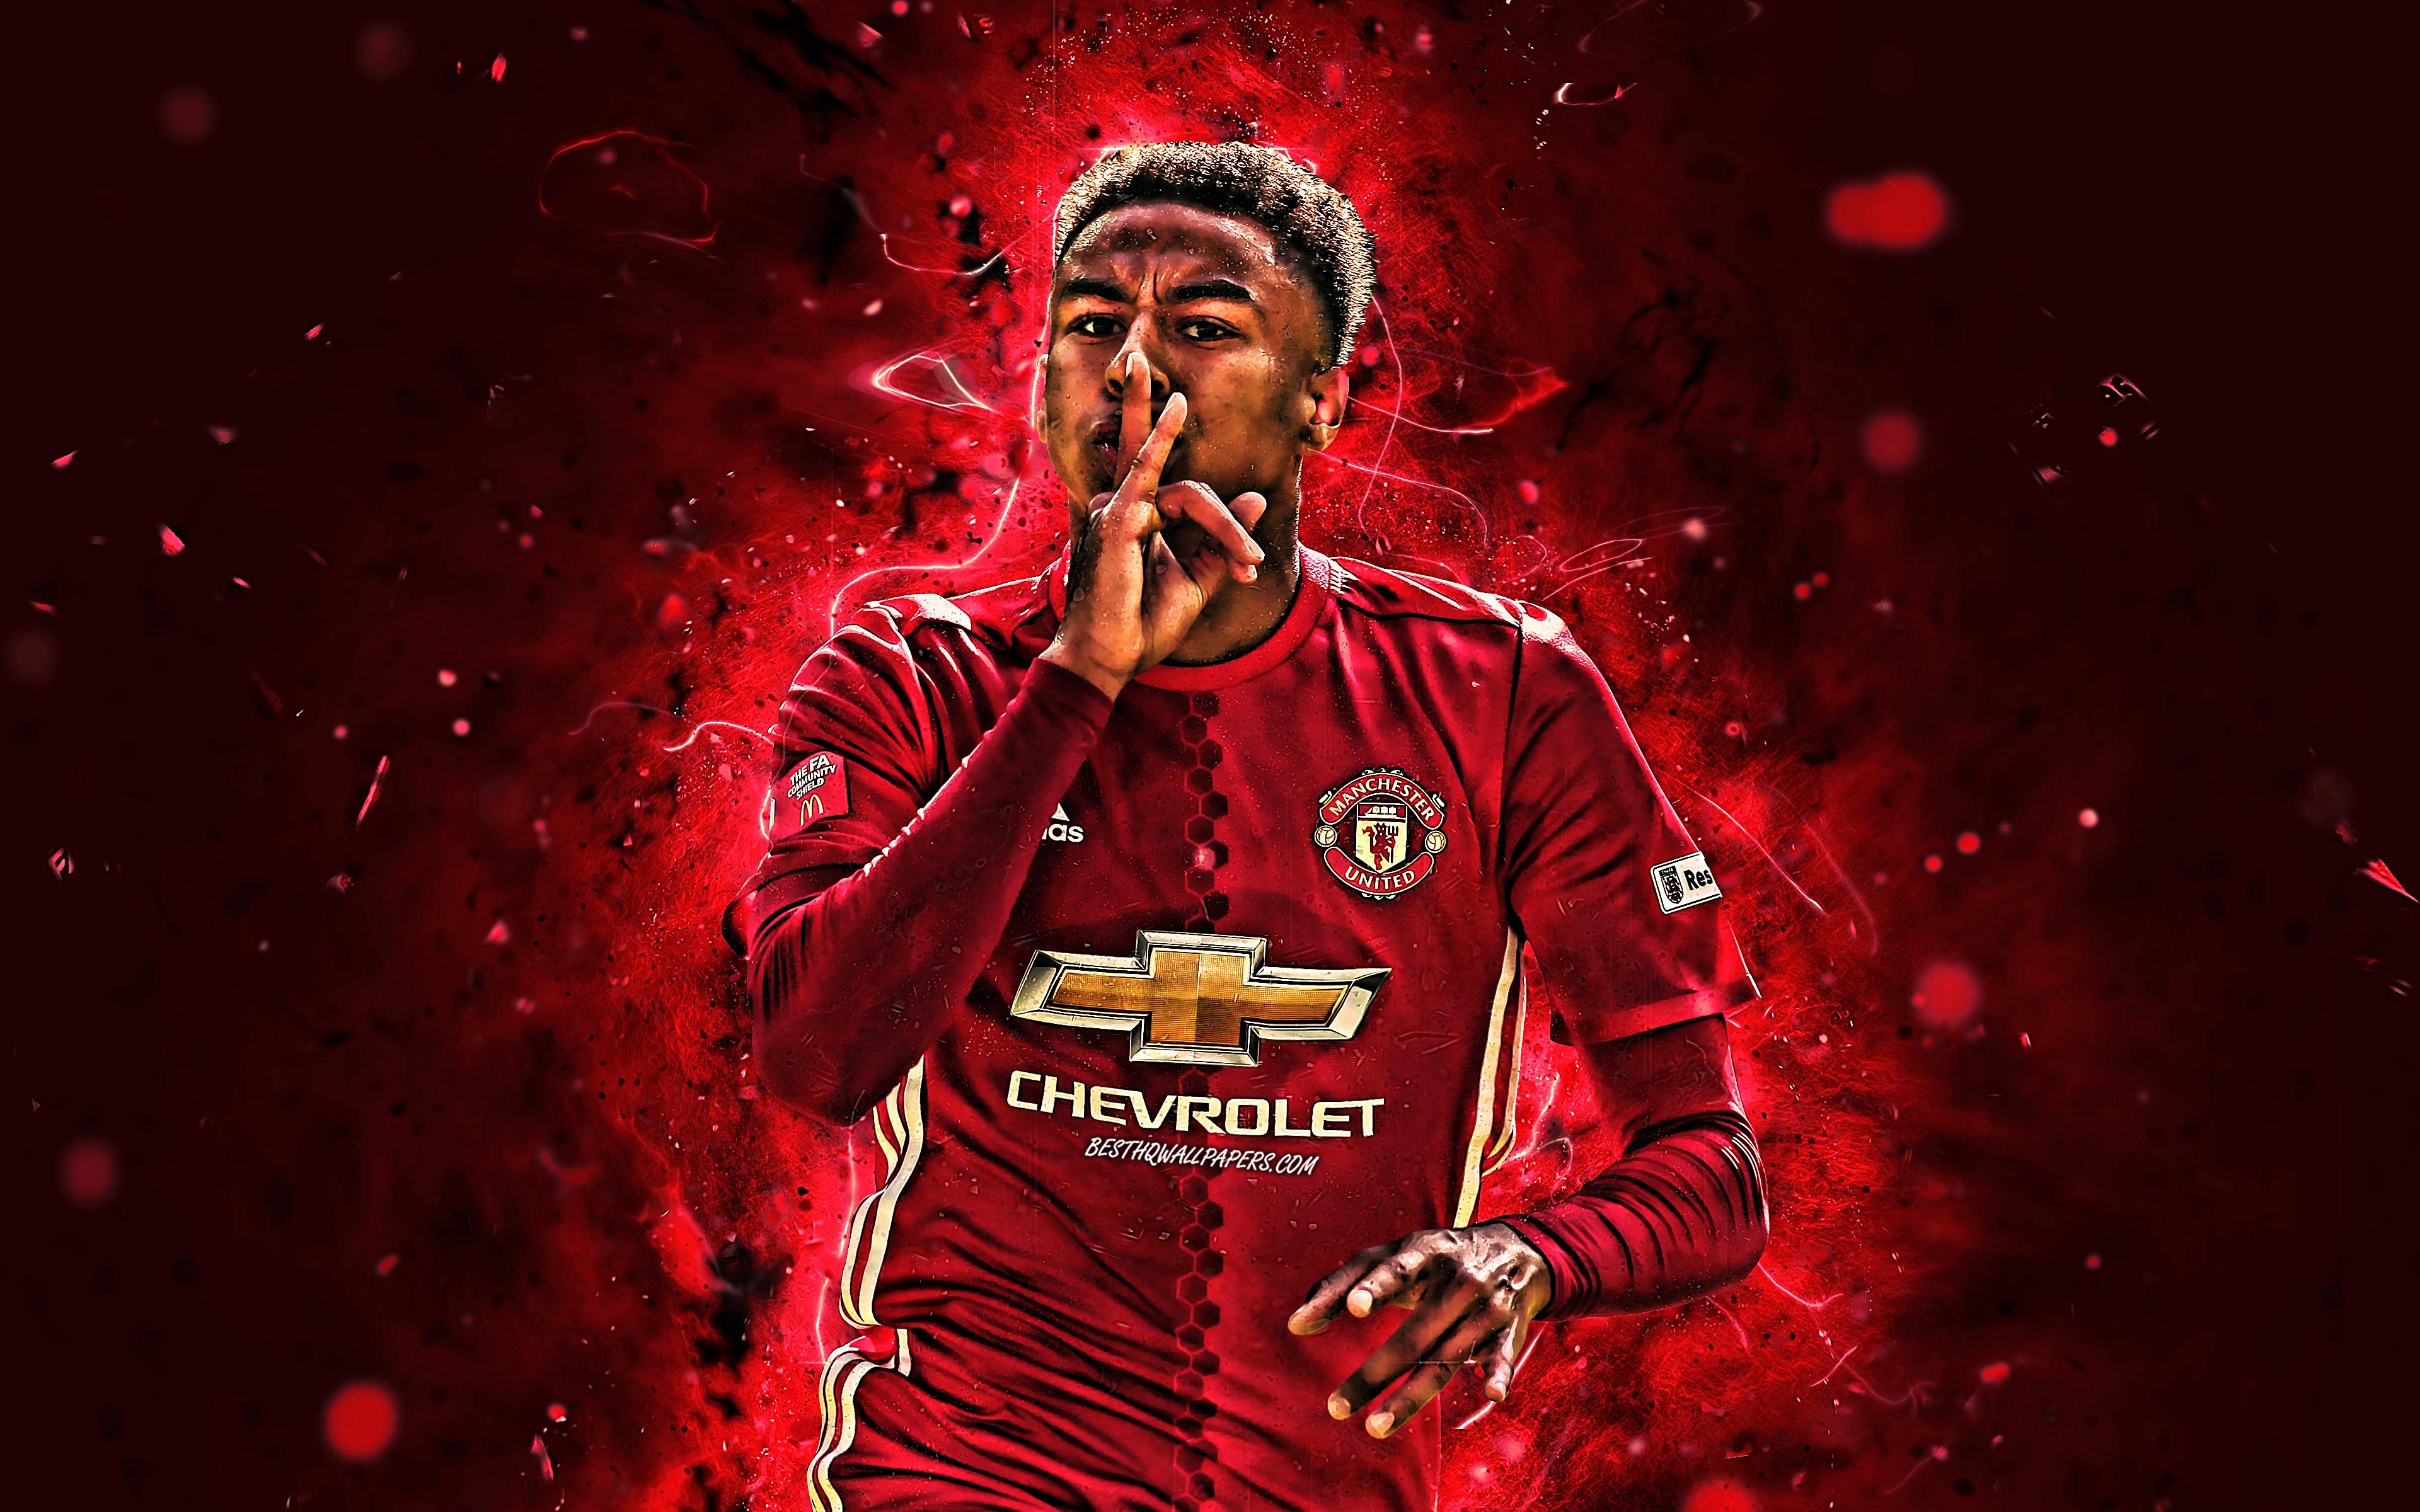 4k Jesse Lingard Goal Manchester United Fc English Nemanja Matic Wallpaper Hd 3840x2400 Wallpaper Teahub Io